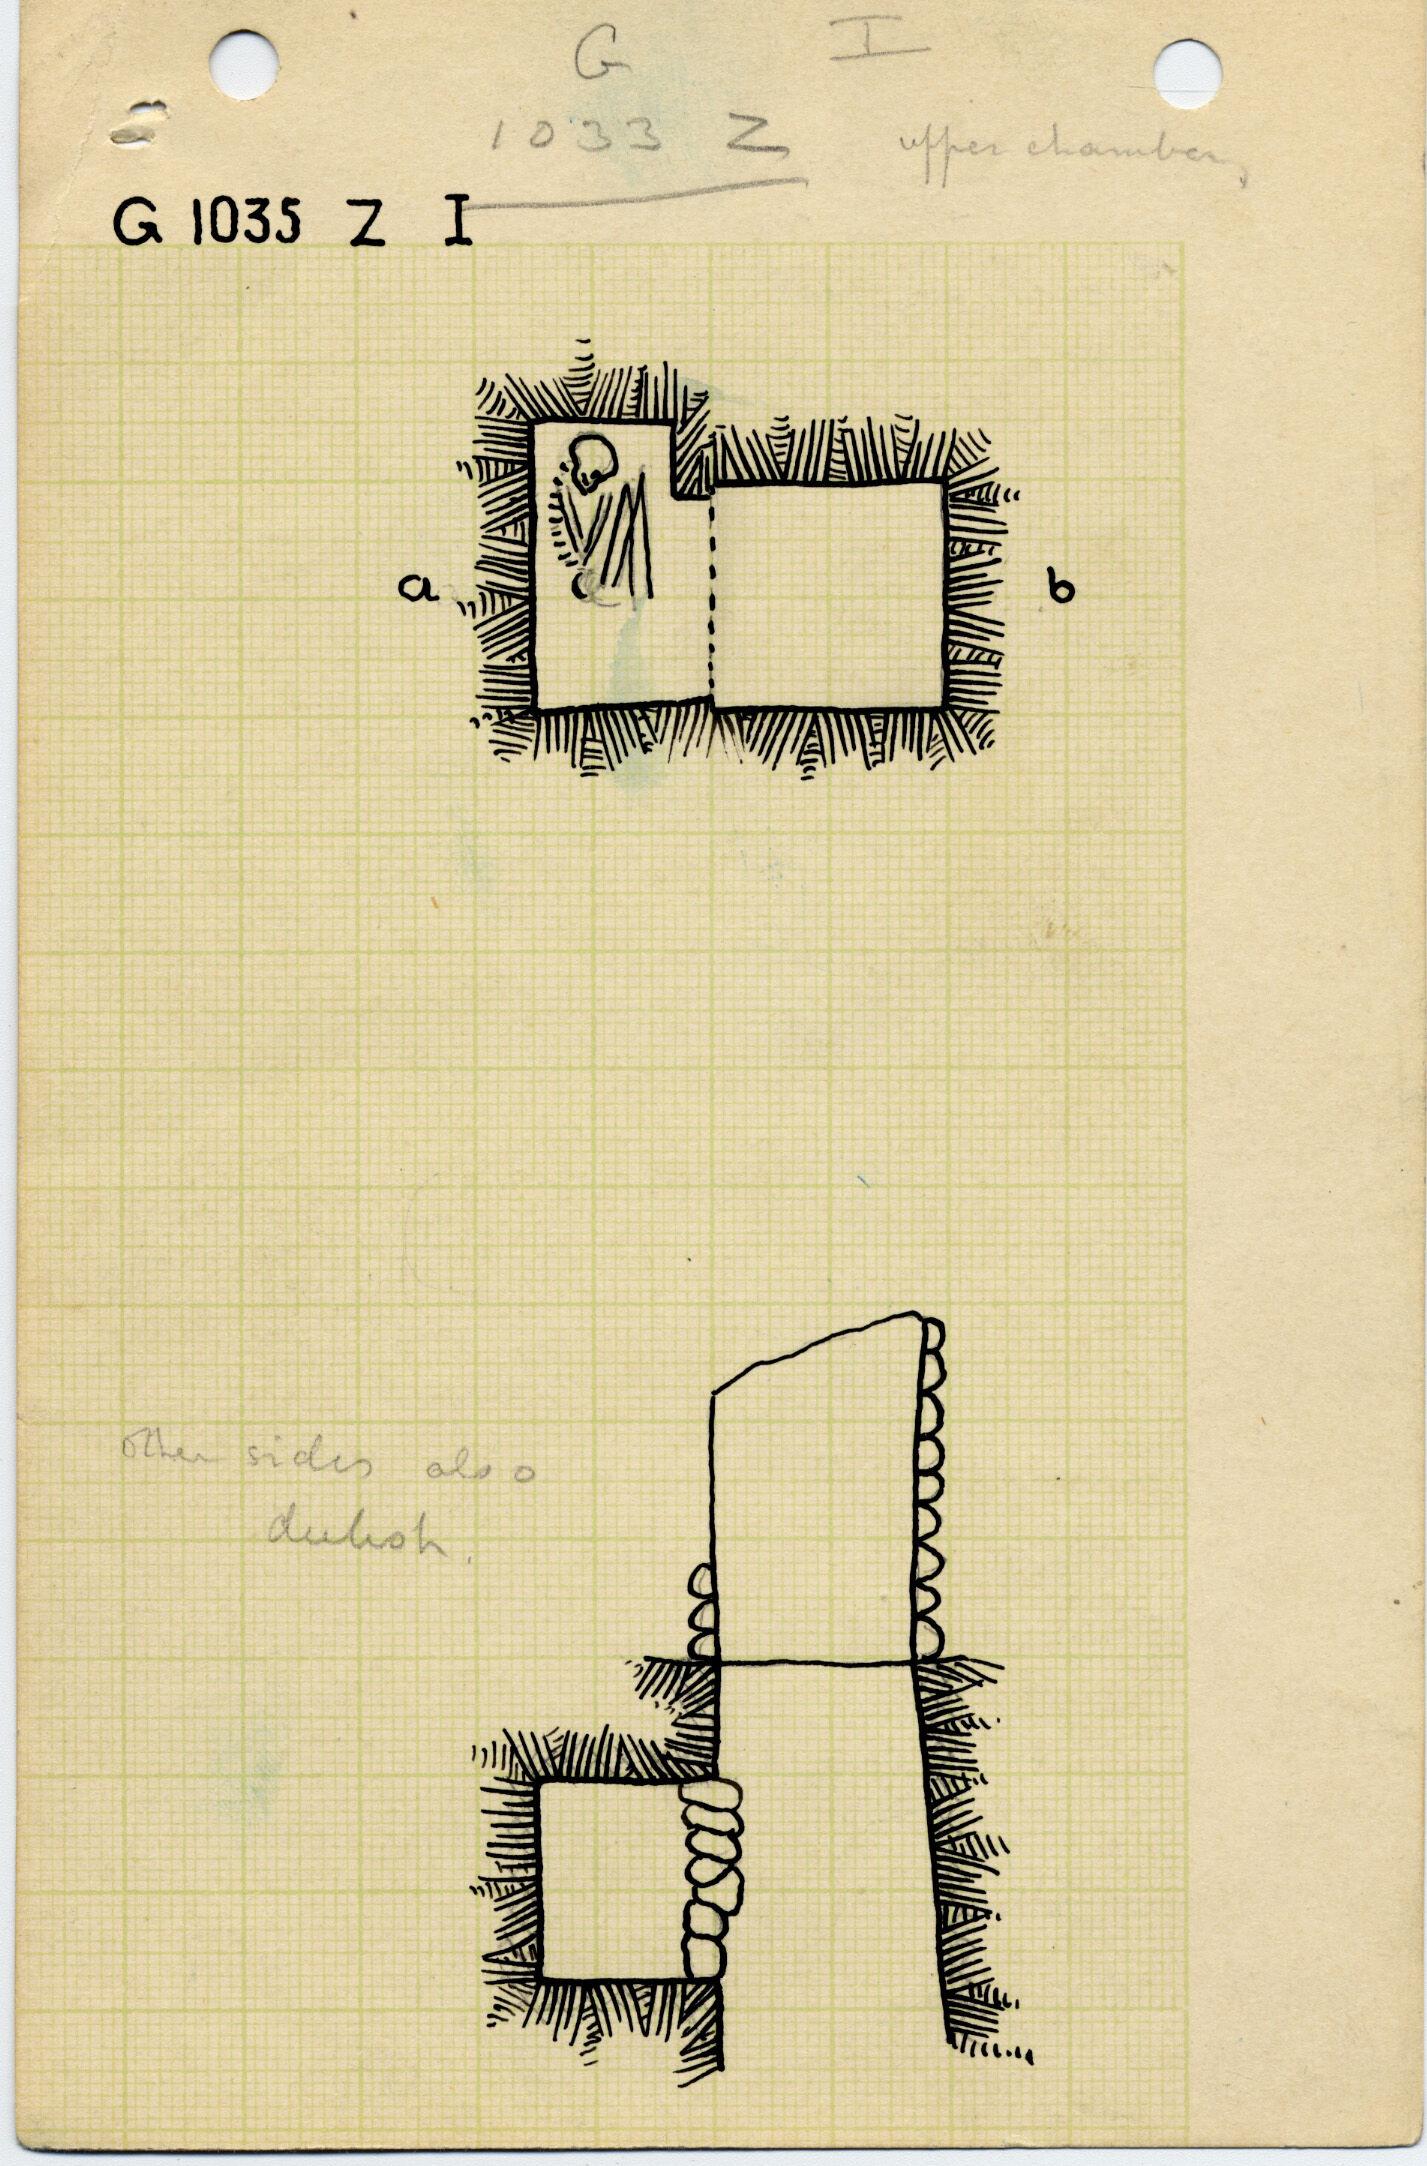 Maps and plans: G 1035z, Shaft Z (I)